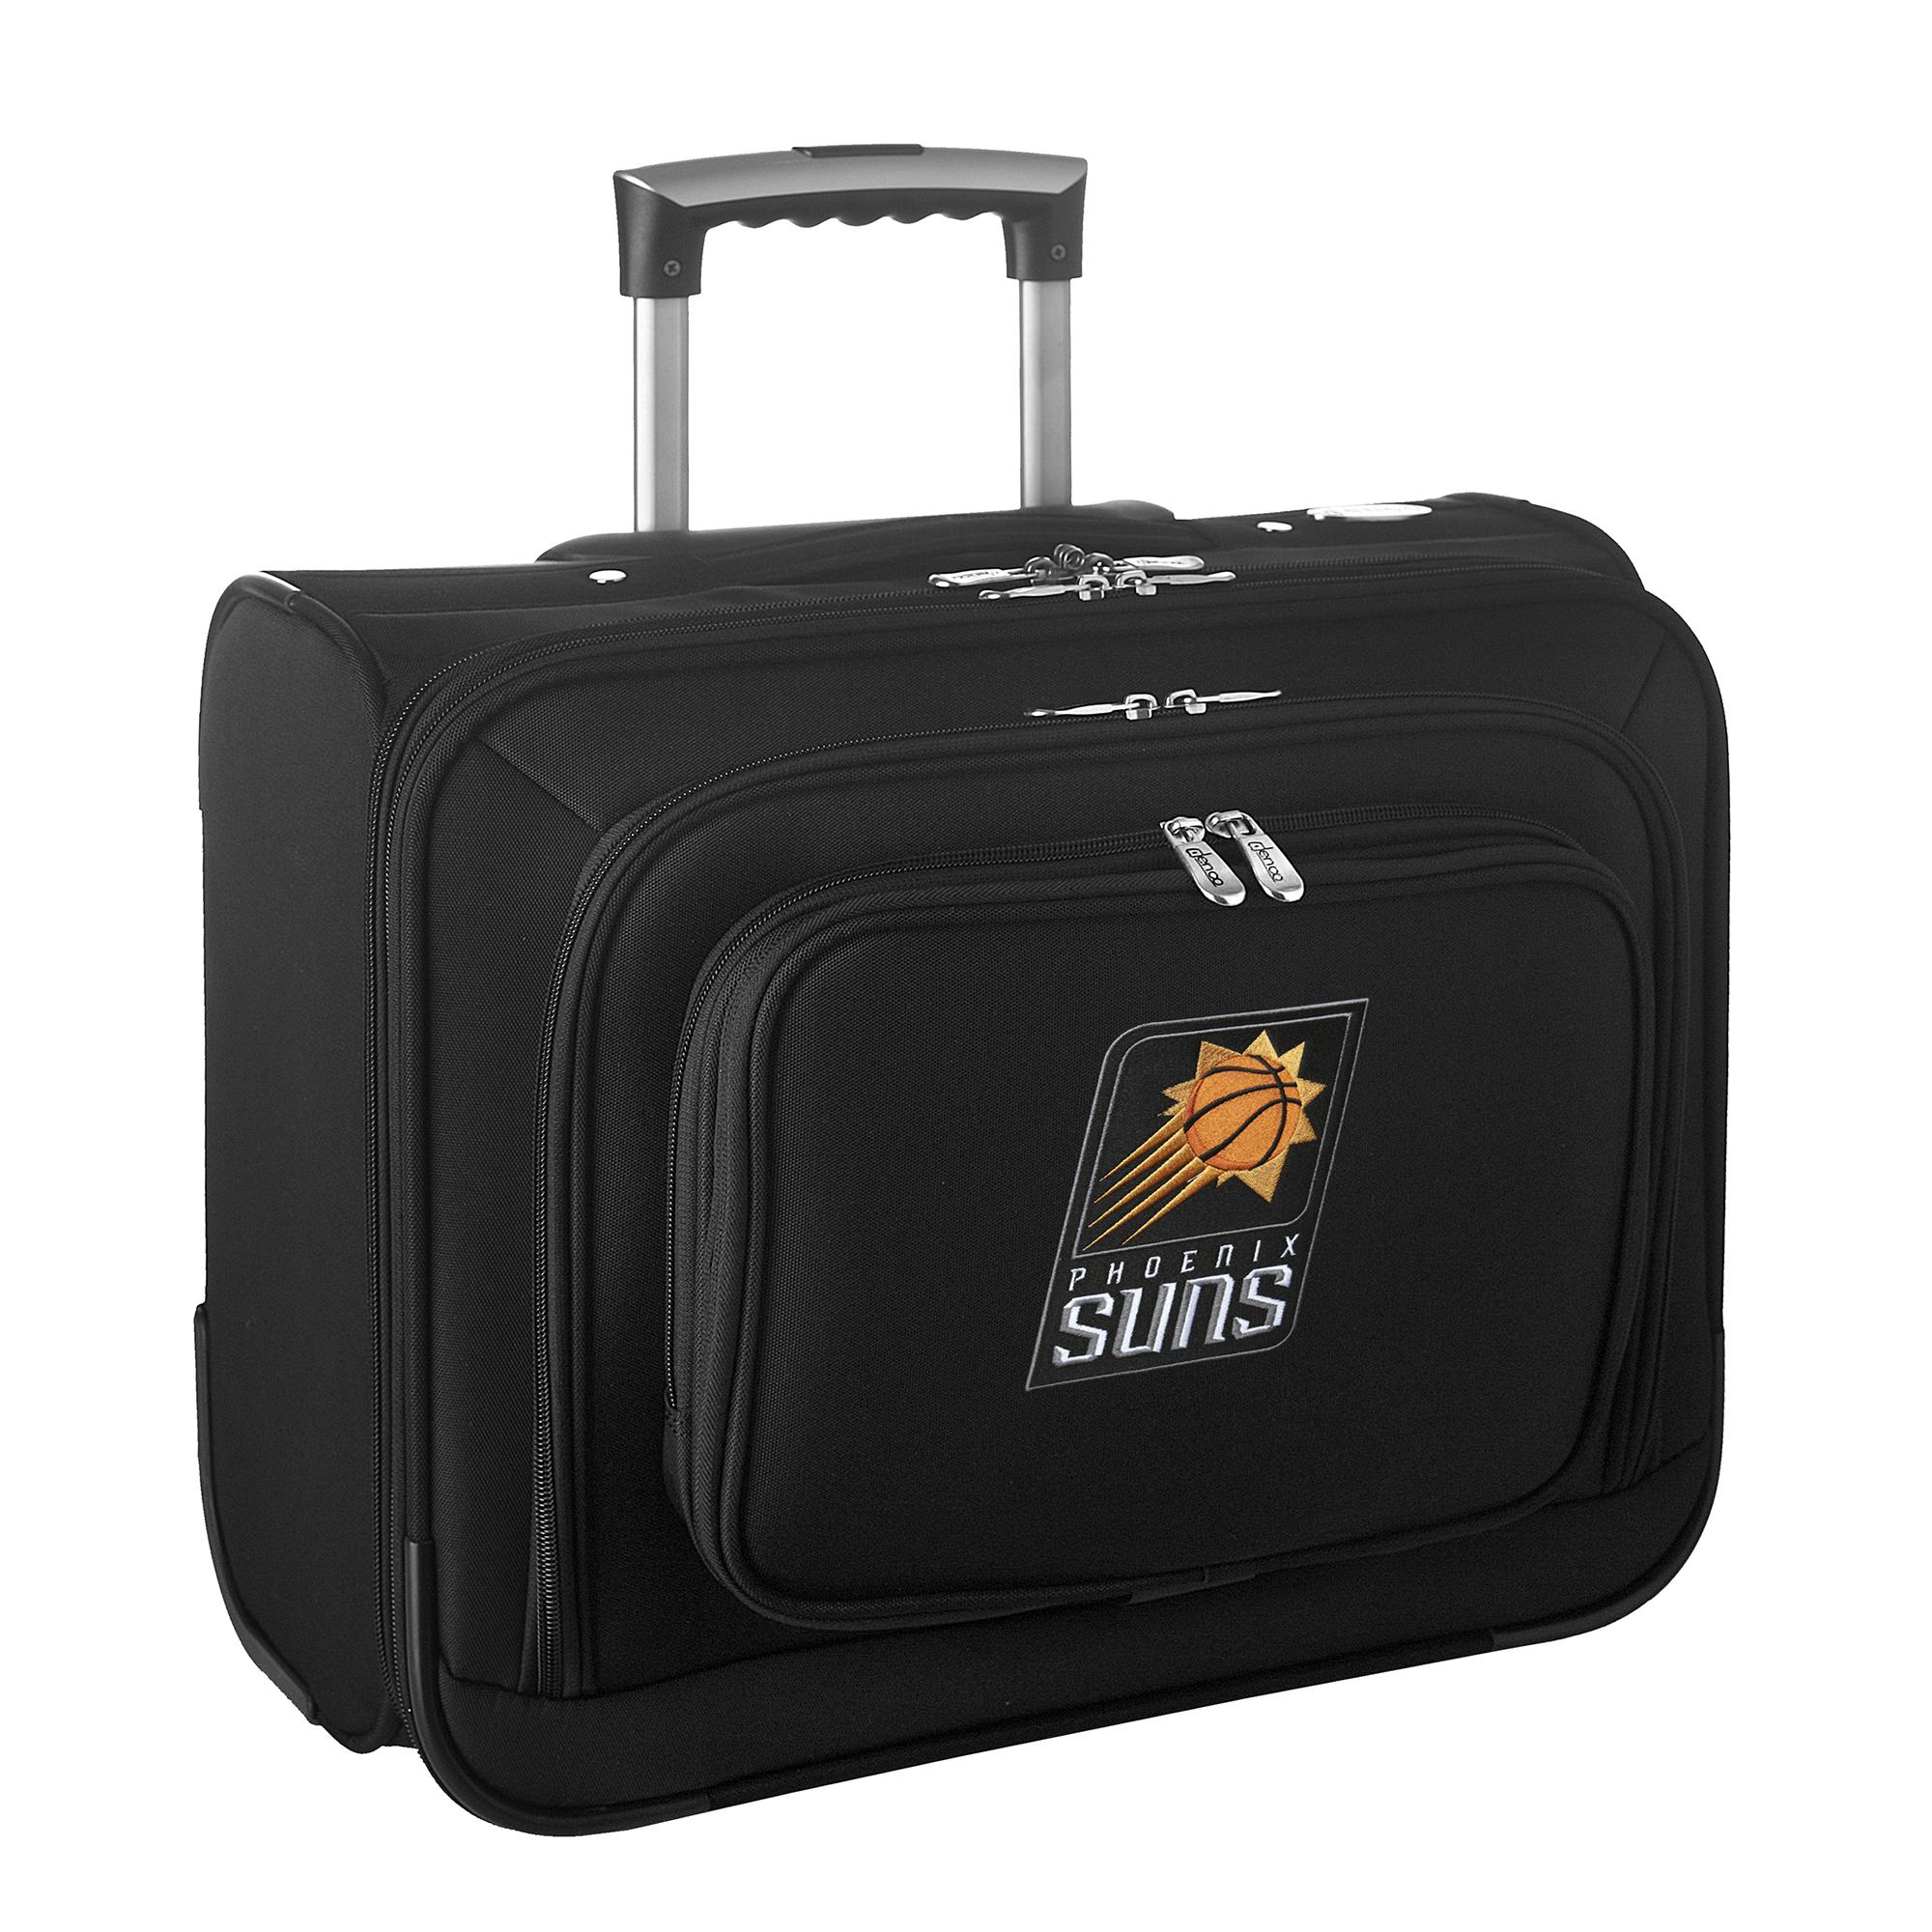 "Phoenix Suns 14"" 2-Wheeled Laptop Overnighter Travel Case - Black - No Size"